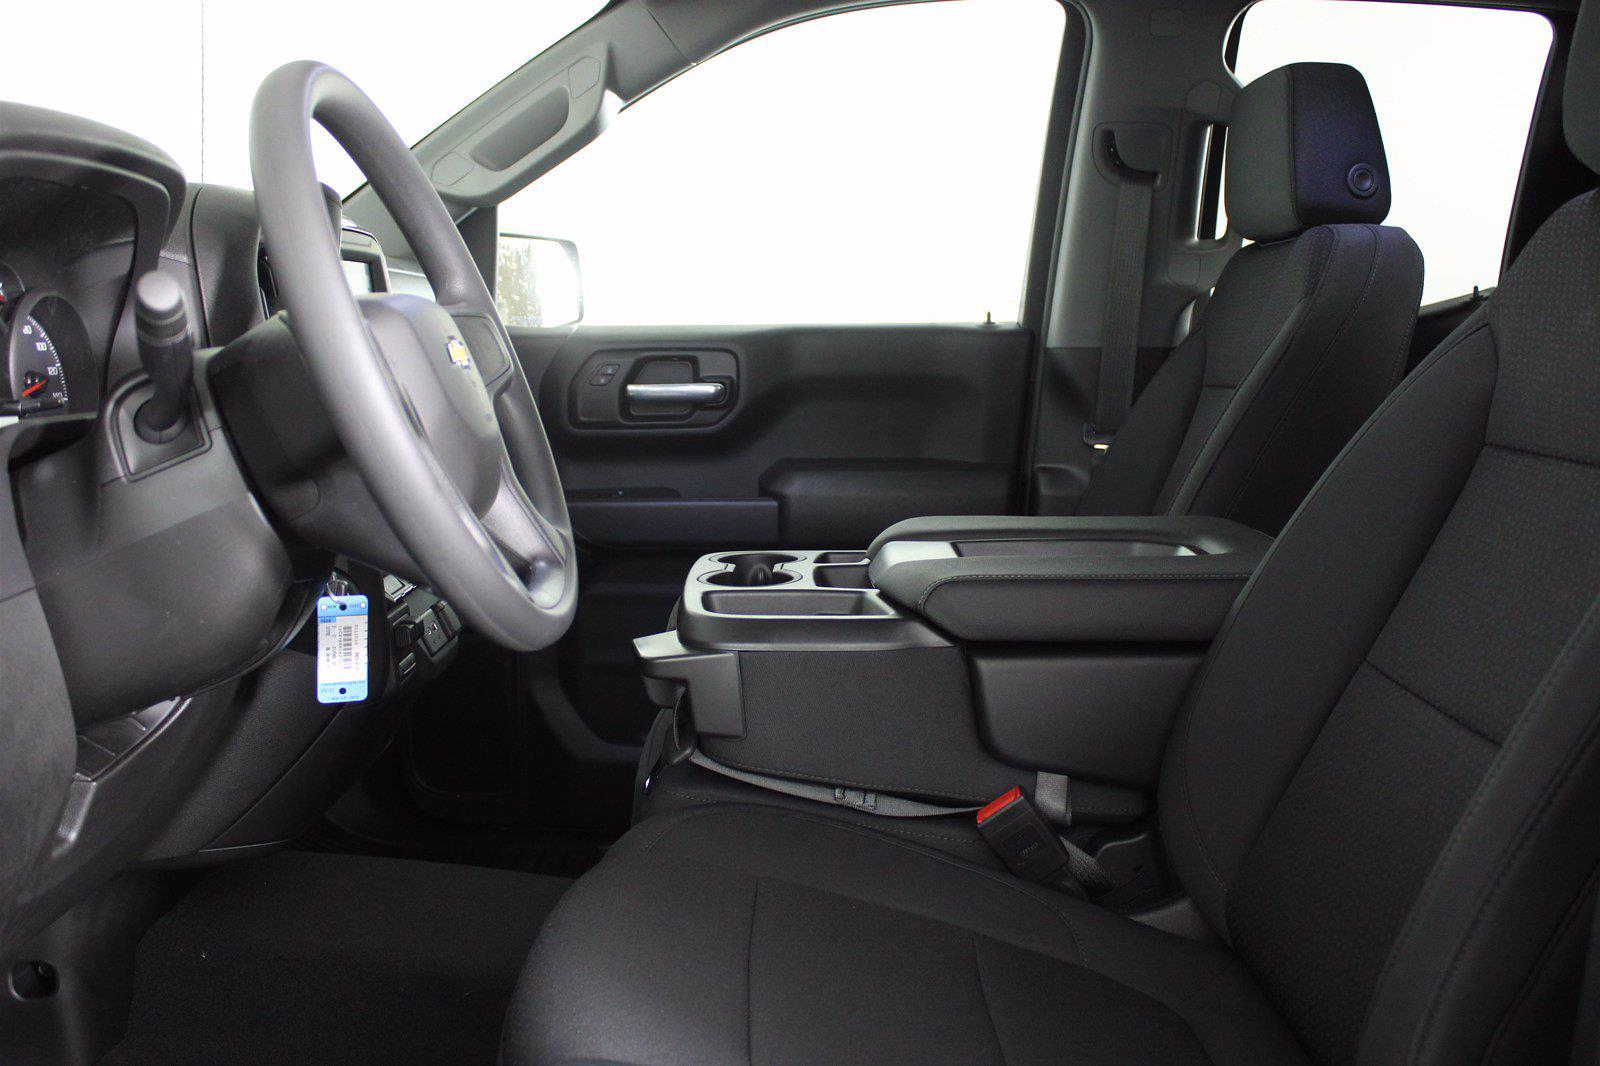 2021 Chevrolet Silverado 1500 Double Cab 4x4, Pickup #D111013 - photo 14